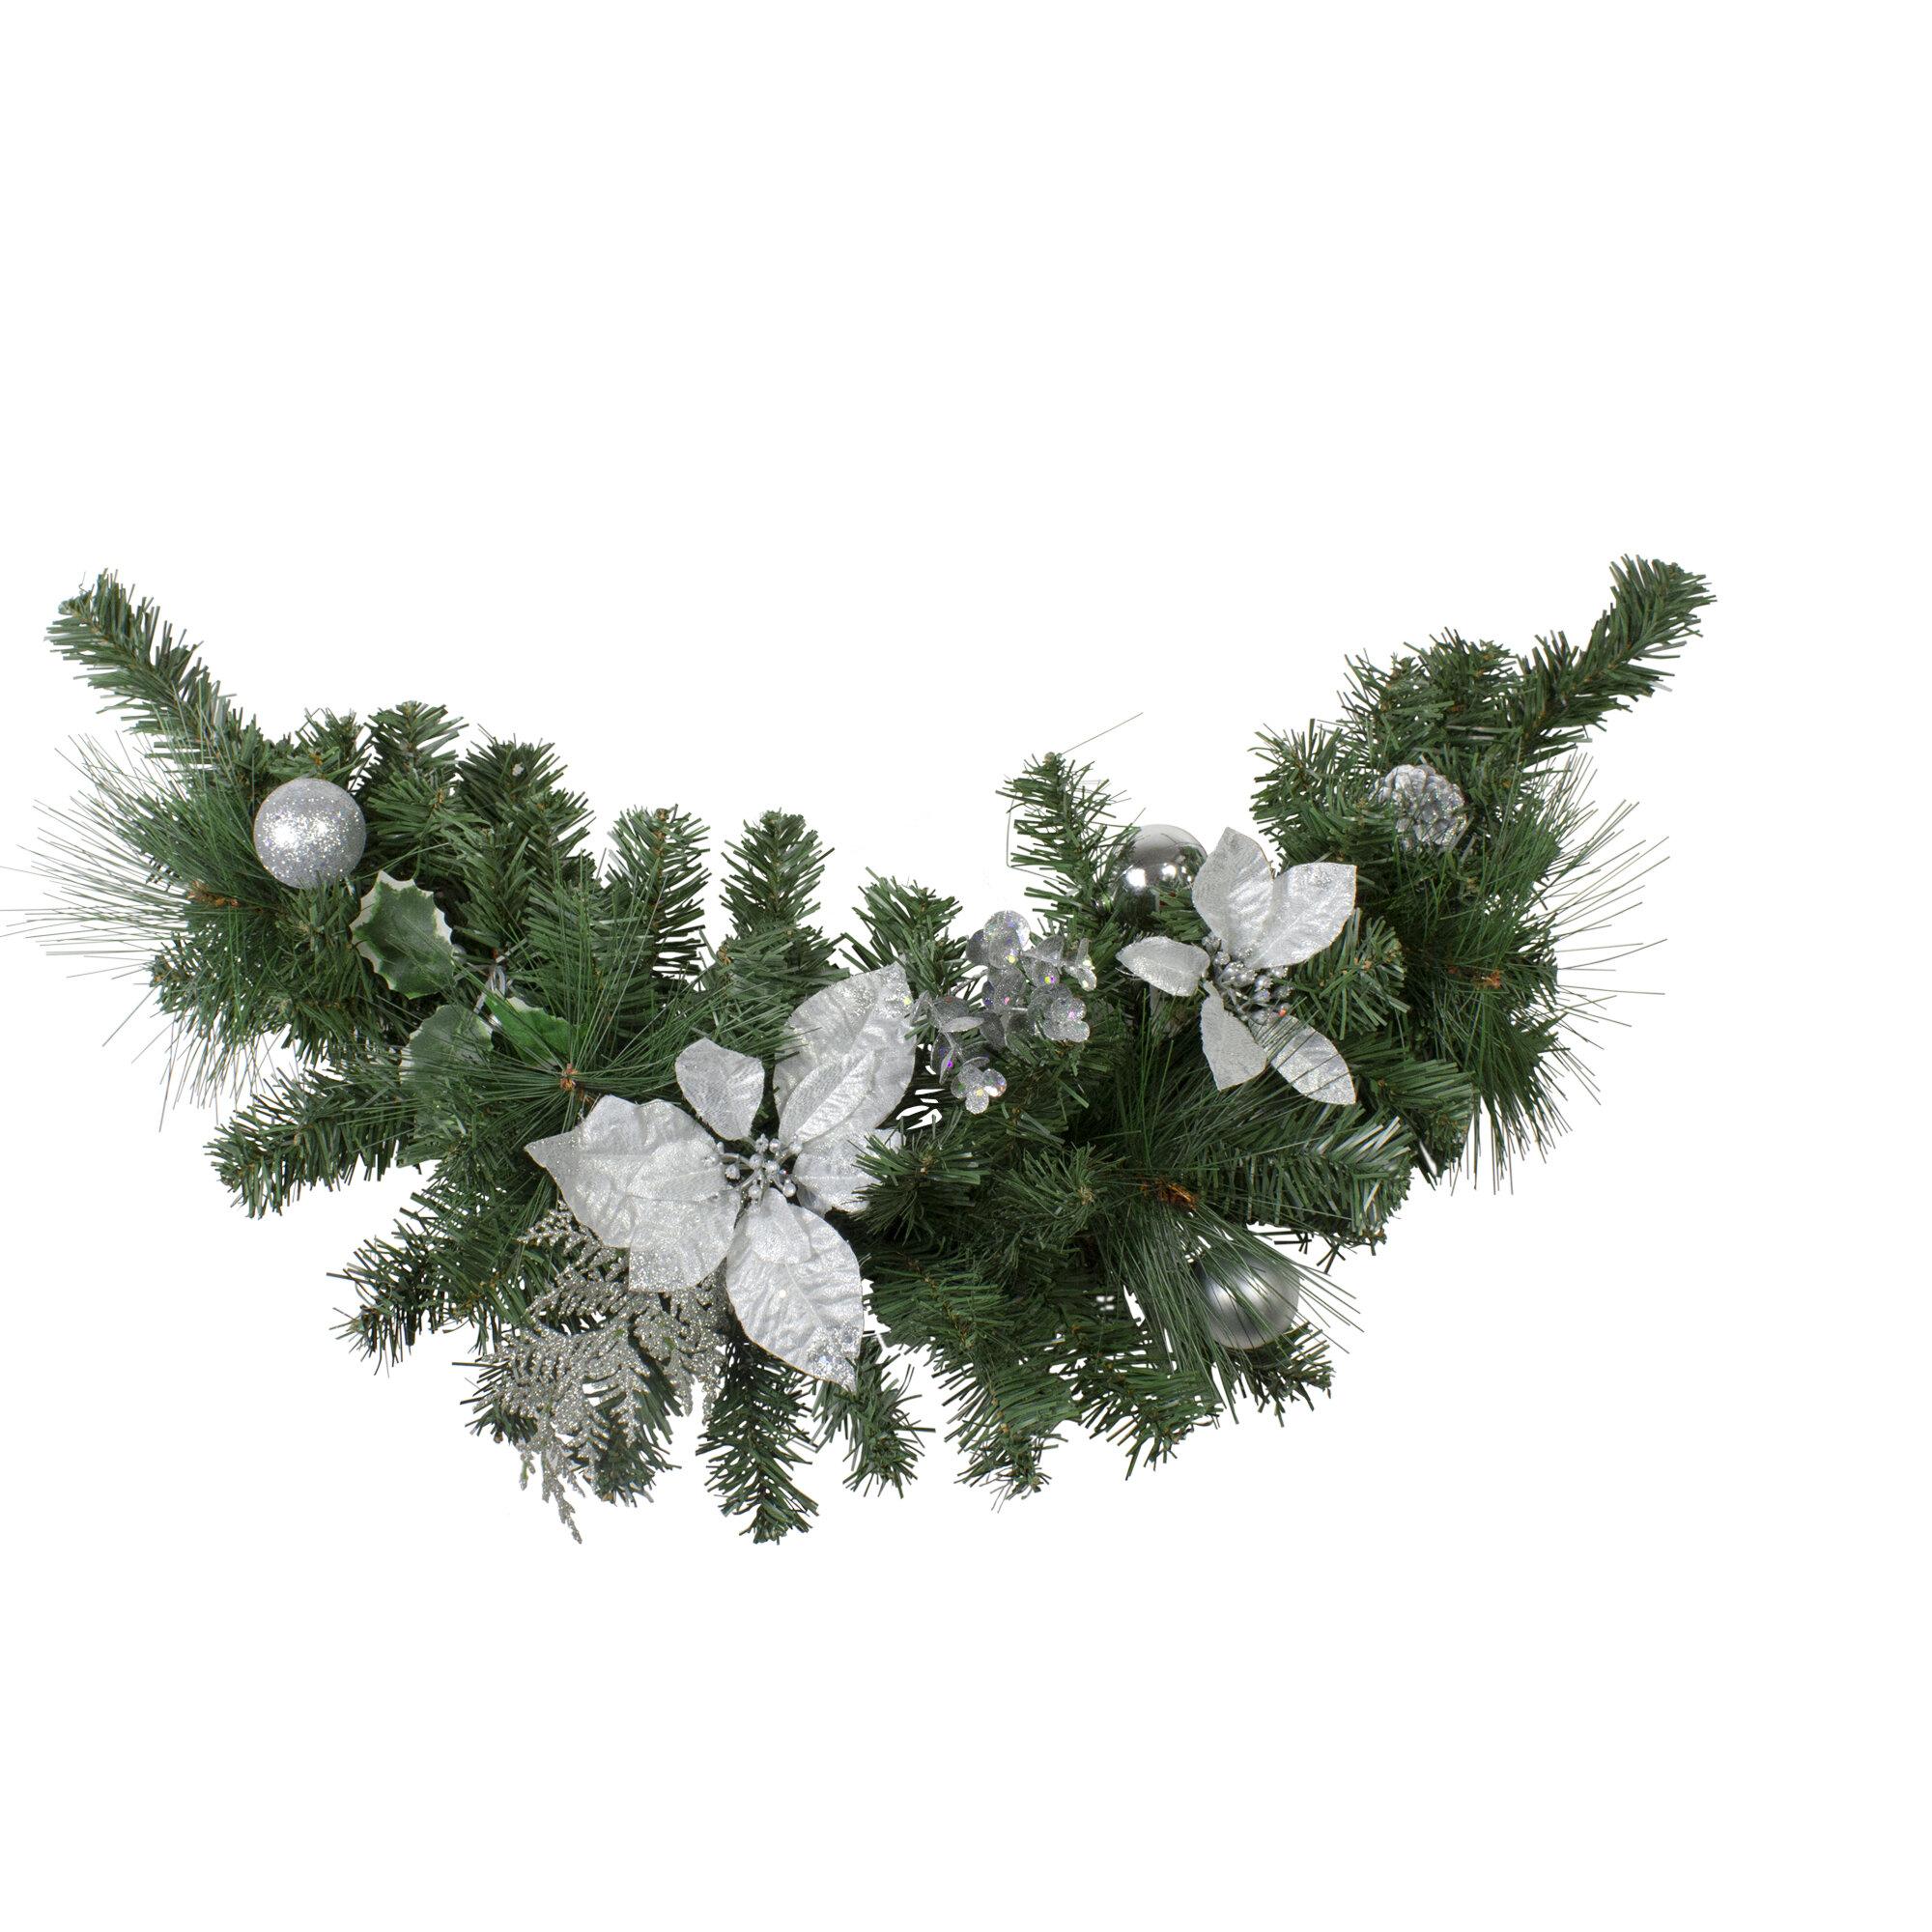 Gold Glitter Leaf Artificial Christmas Garland Swag Decoration Ornament